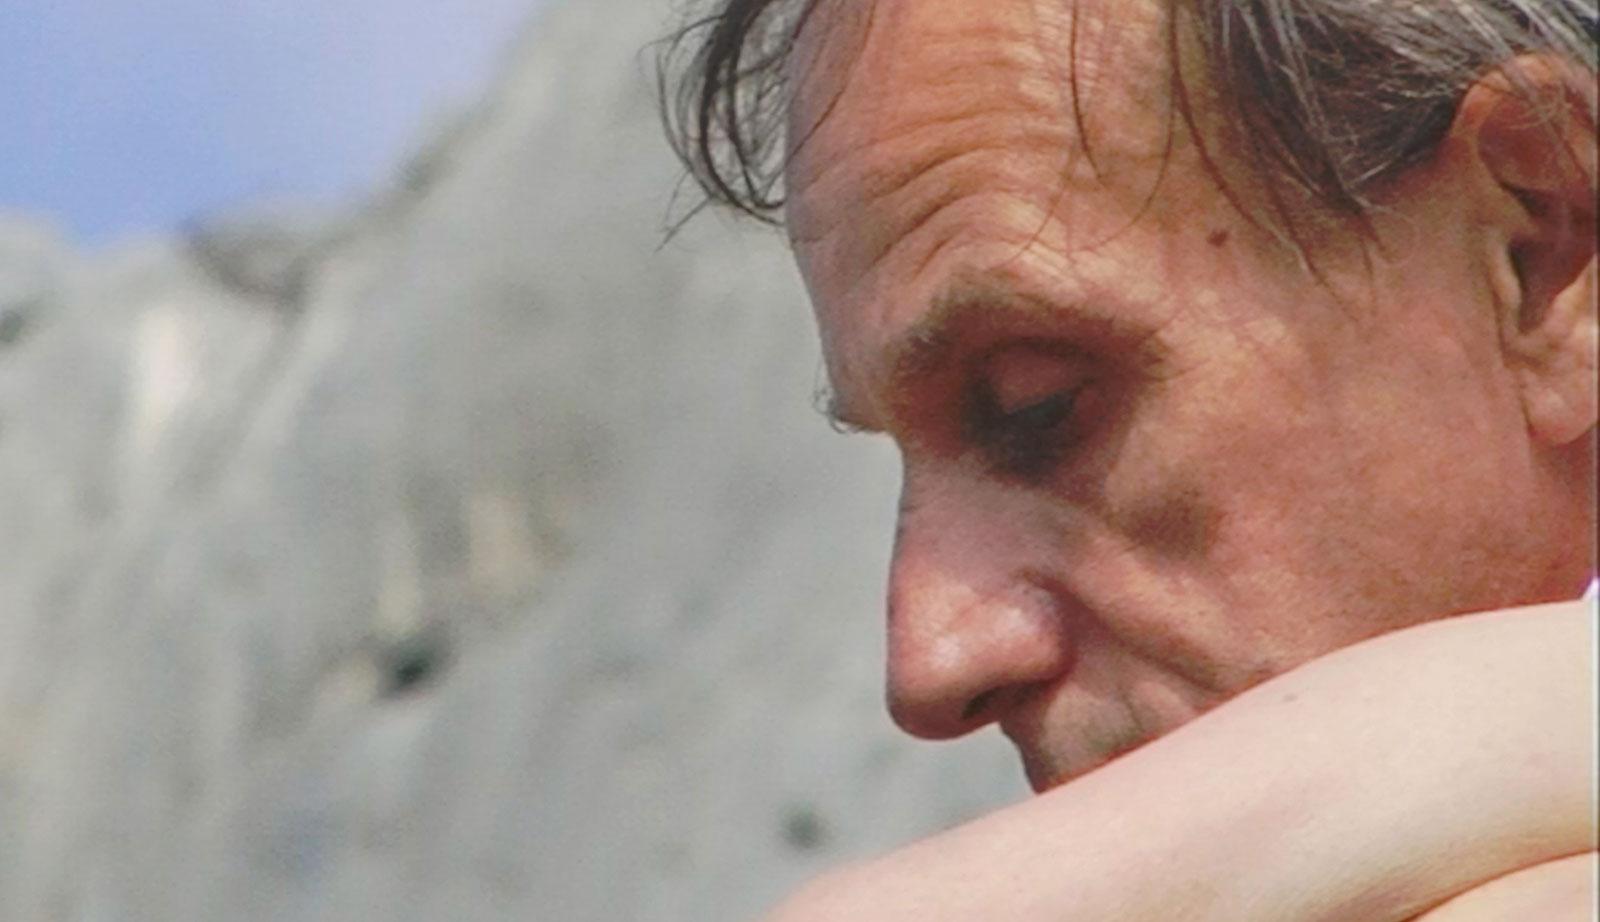 Michel Houellebecq nei panni di Paul in una scena di Near Death Experience